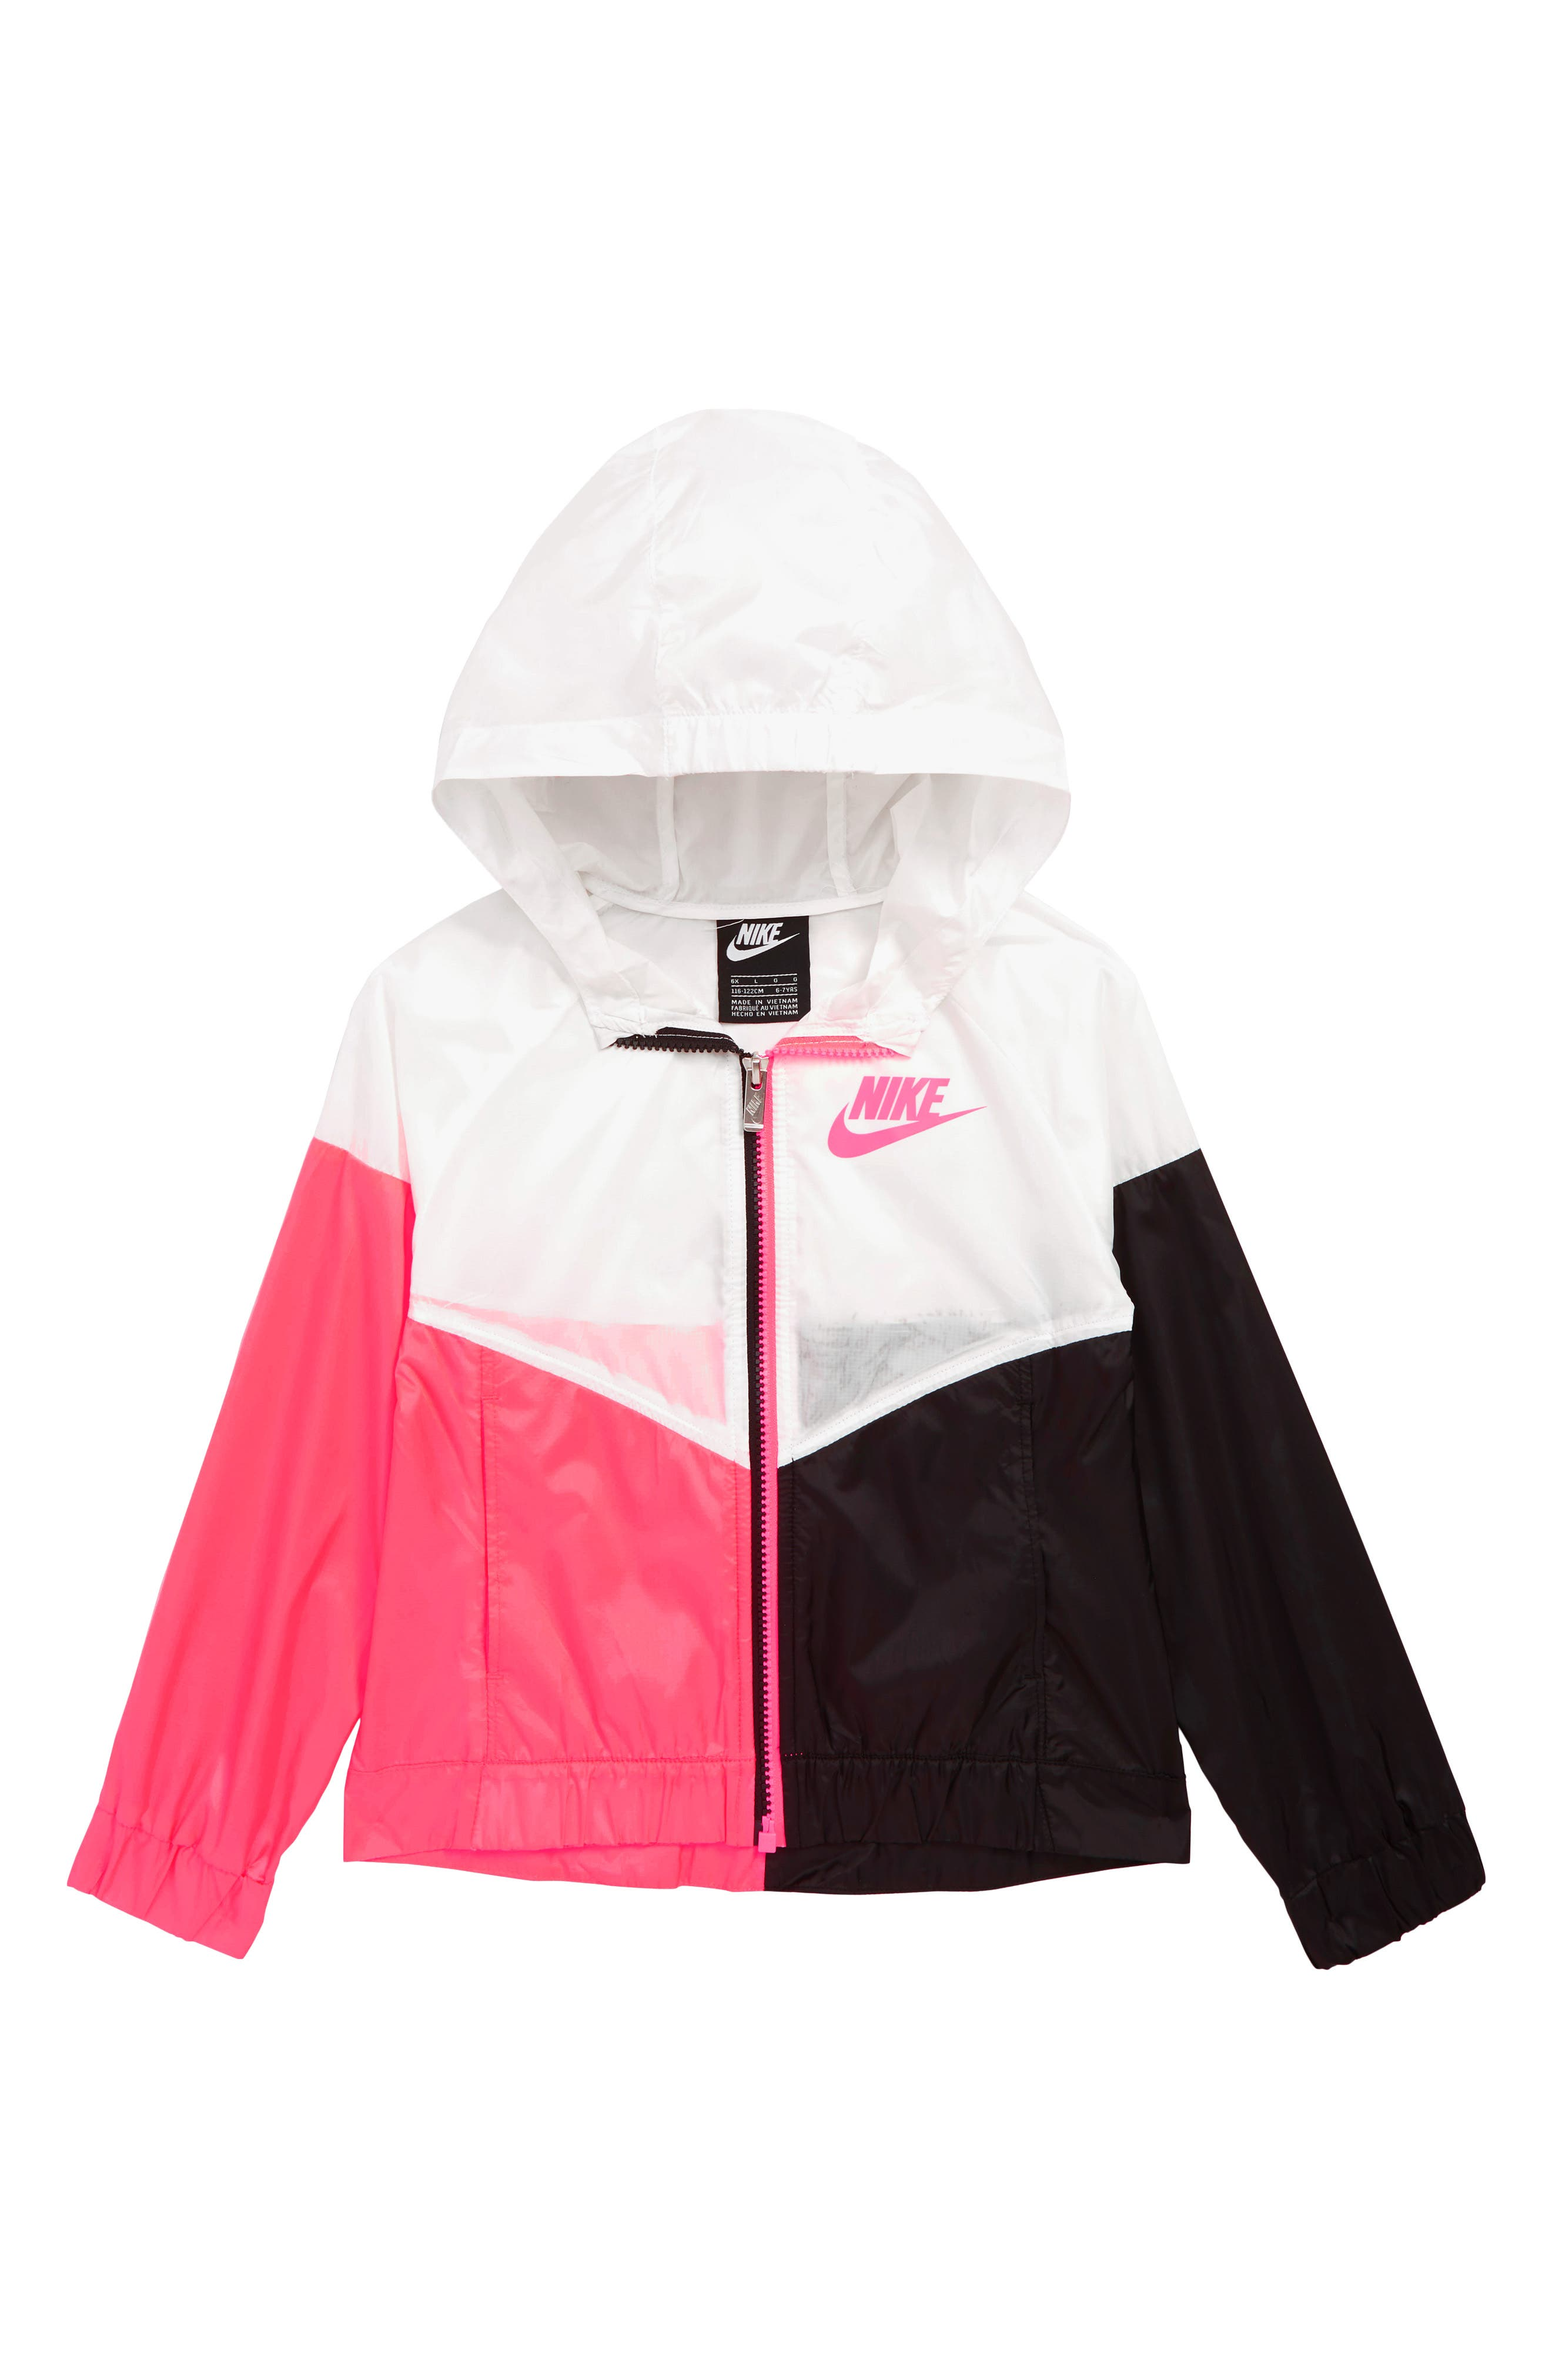 NIKE Windrunner Water Repellent Hooded Jacket, Main, color, RACER PINK